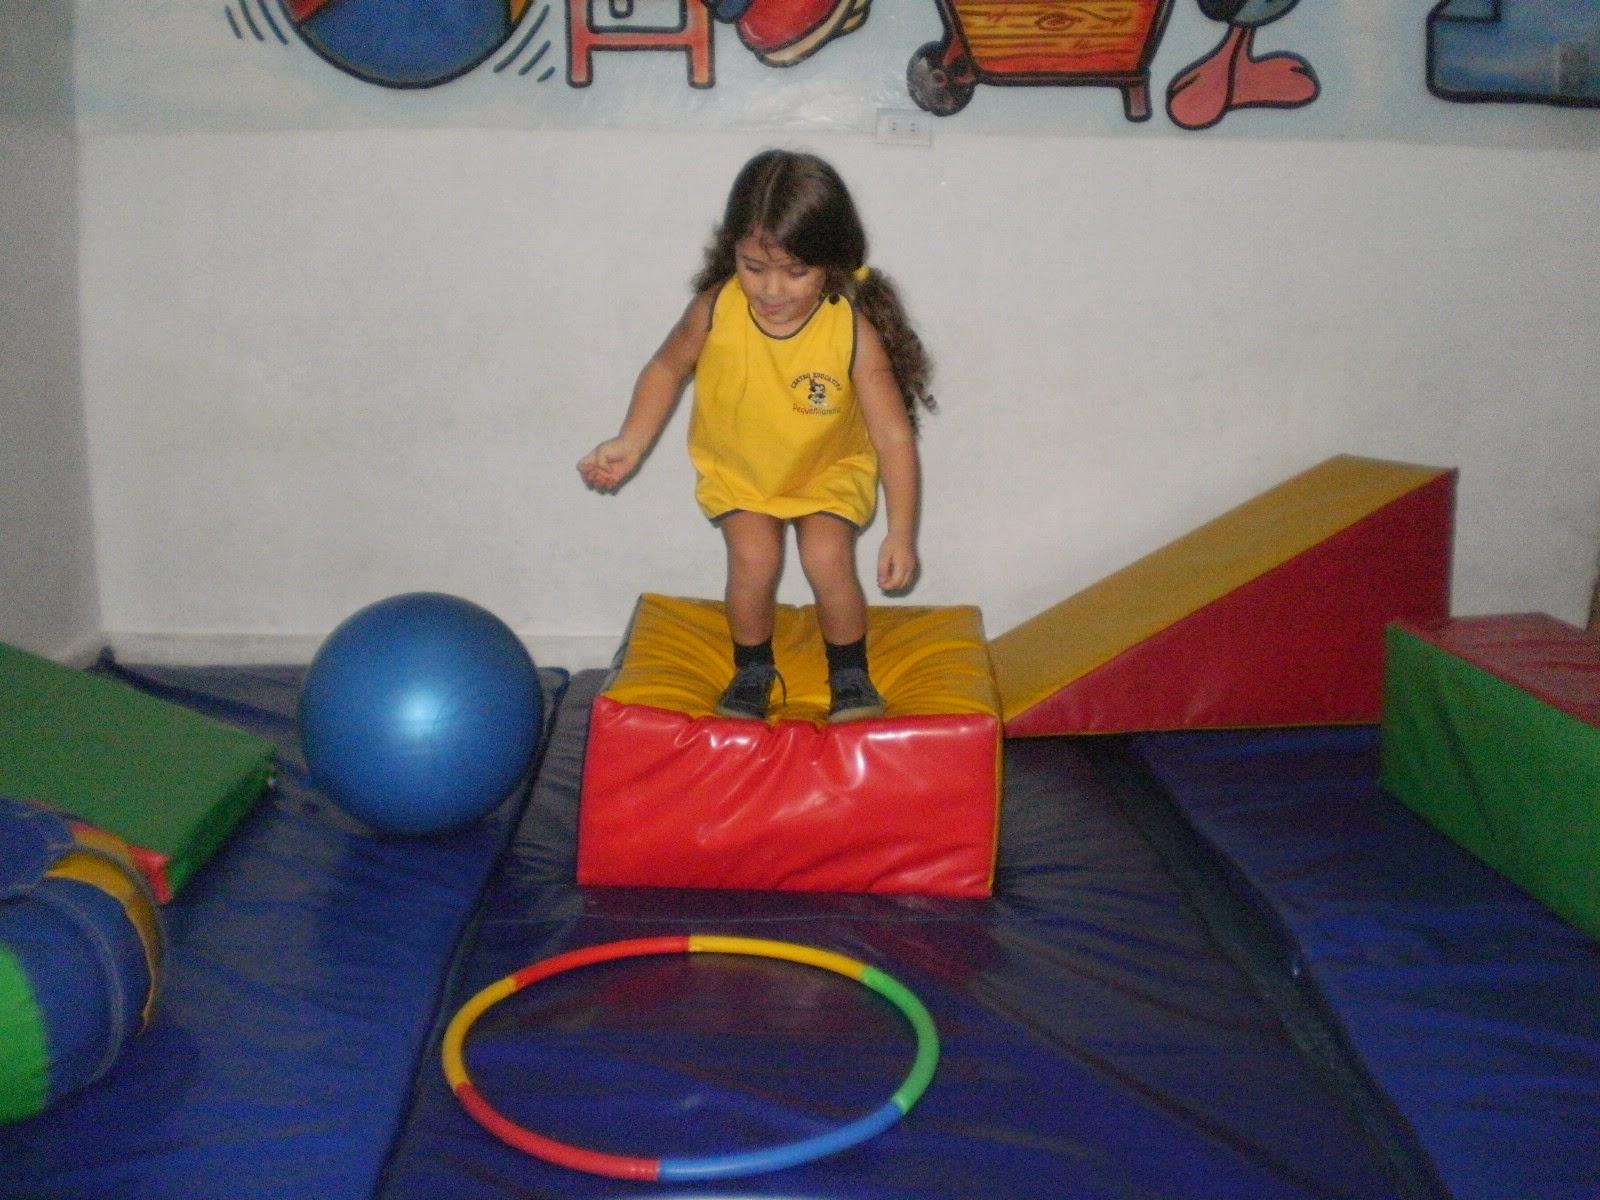 Circuito Juegos Para Niños : FÁbrica de sonrisas para antioquia tema tipos juego